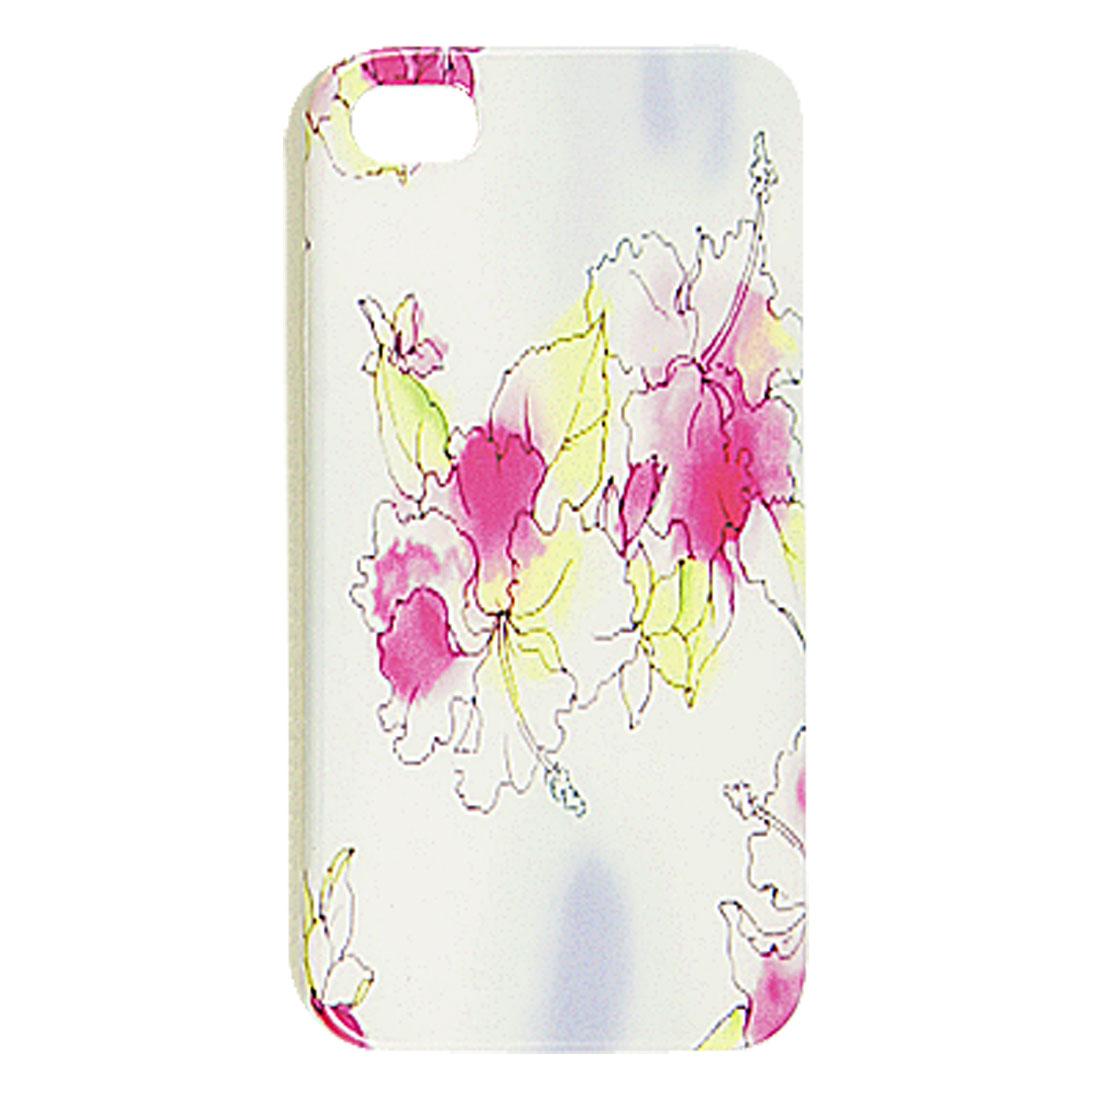 White IMD Hard Plastic Hibiscus Flower Pattern Back Case for iPhone 4 4G 4S